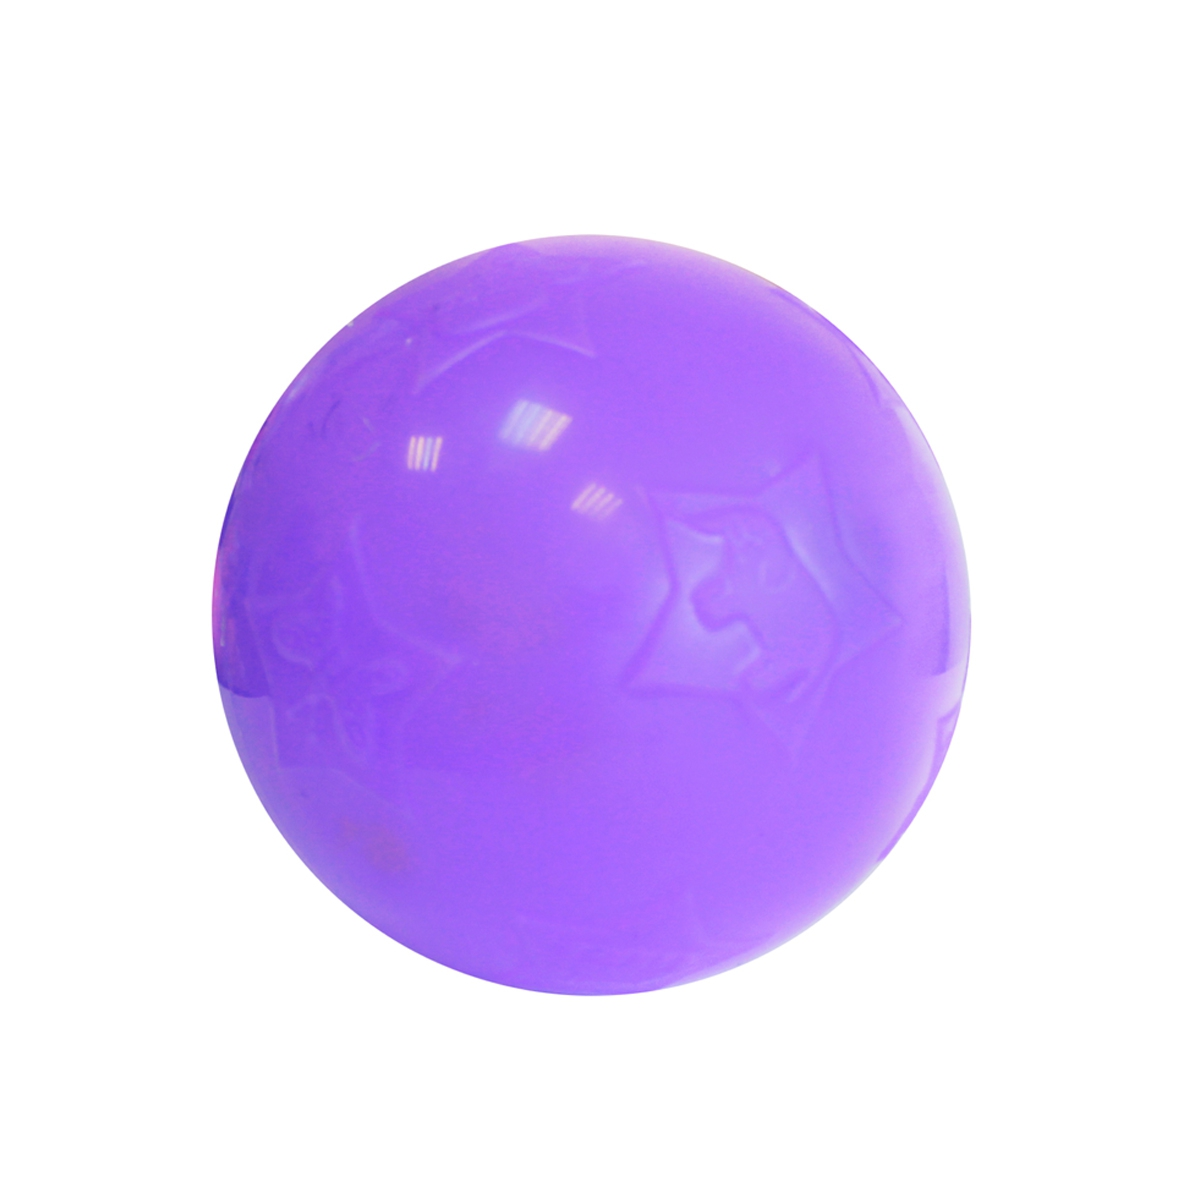 Пластмастер Мяч Нео диаметр 8 см